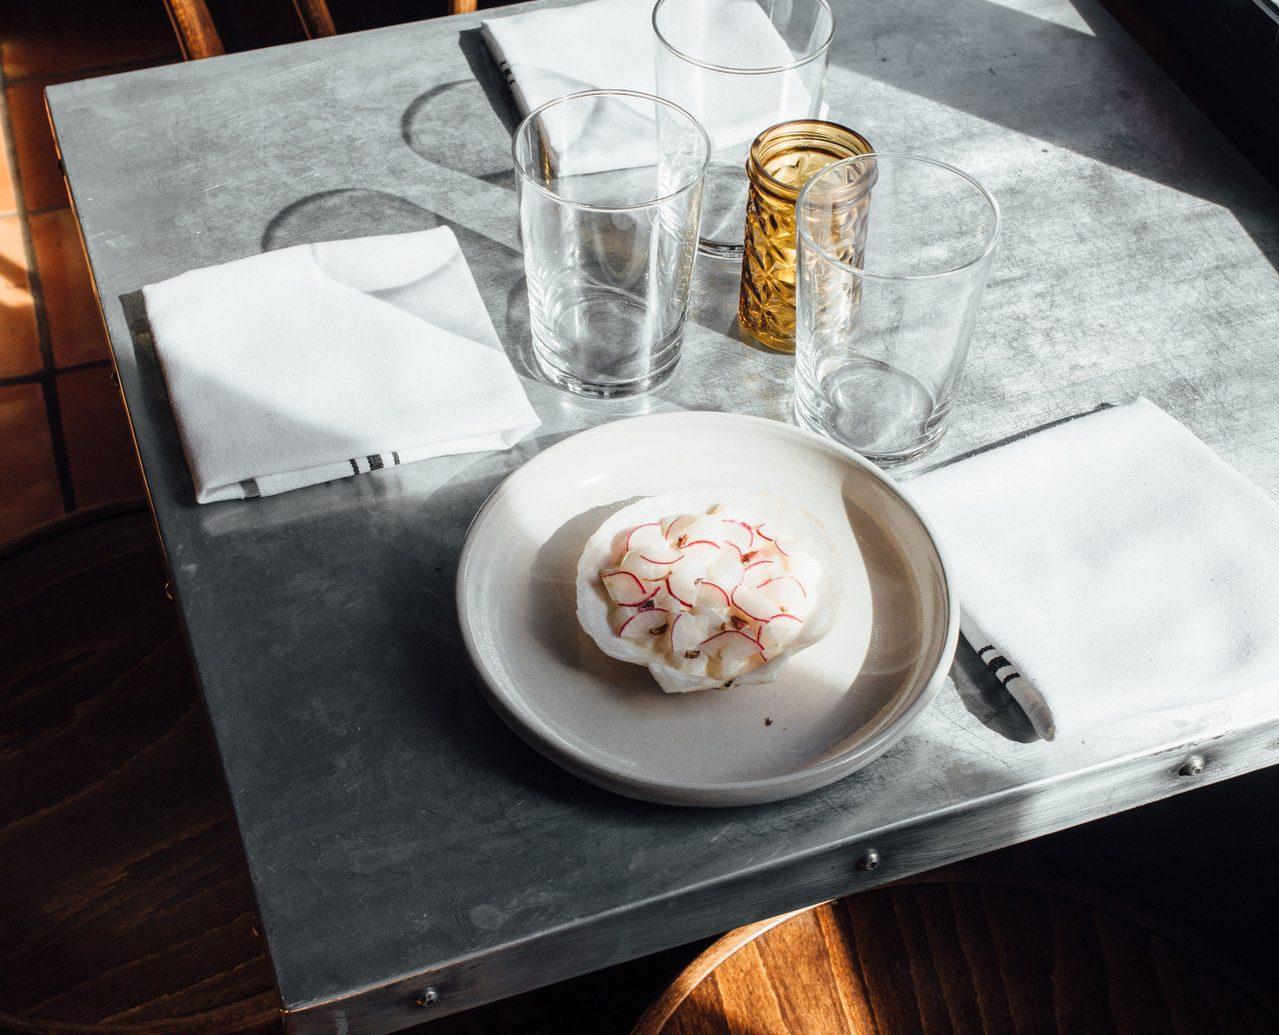 Food + Drink table plate room restaurant meal shape dinner Drink